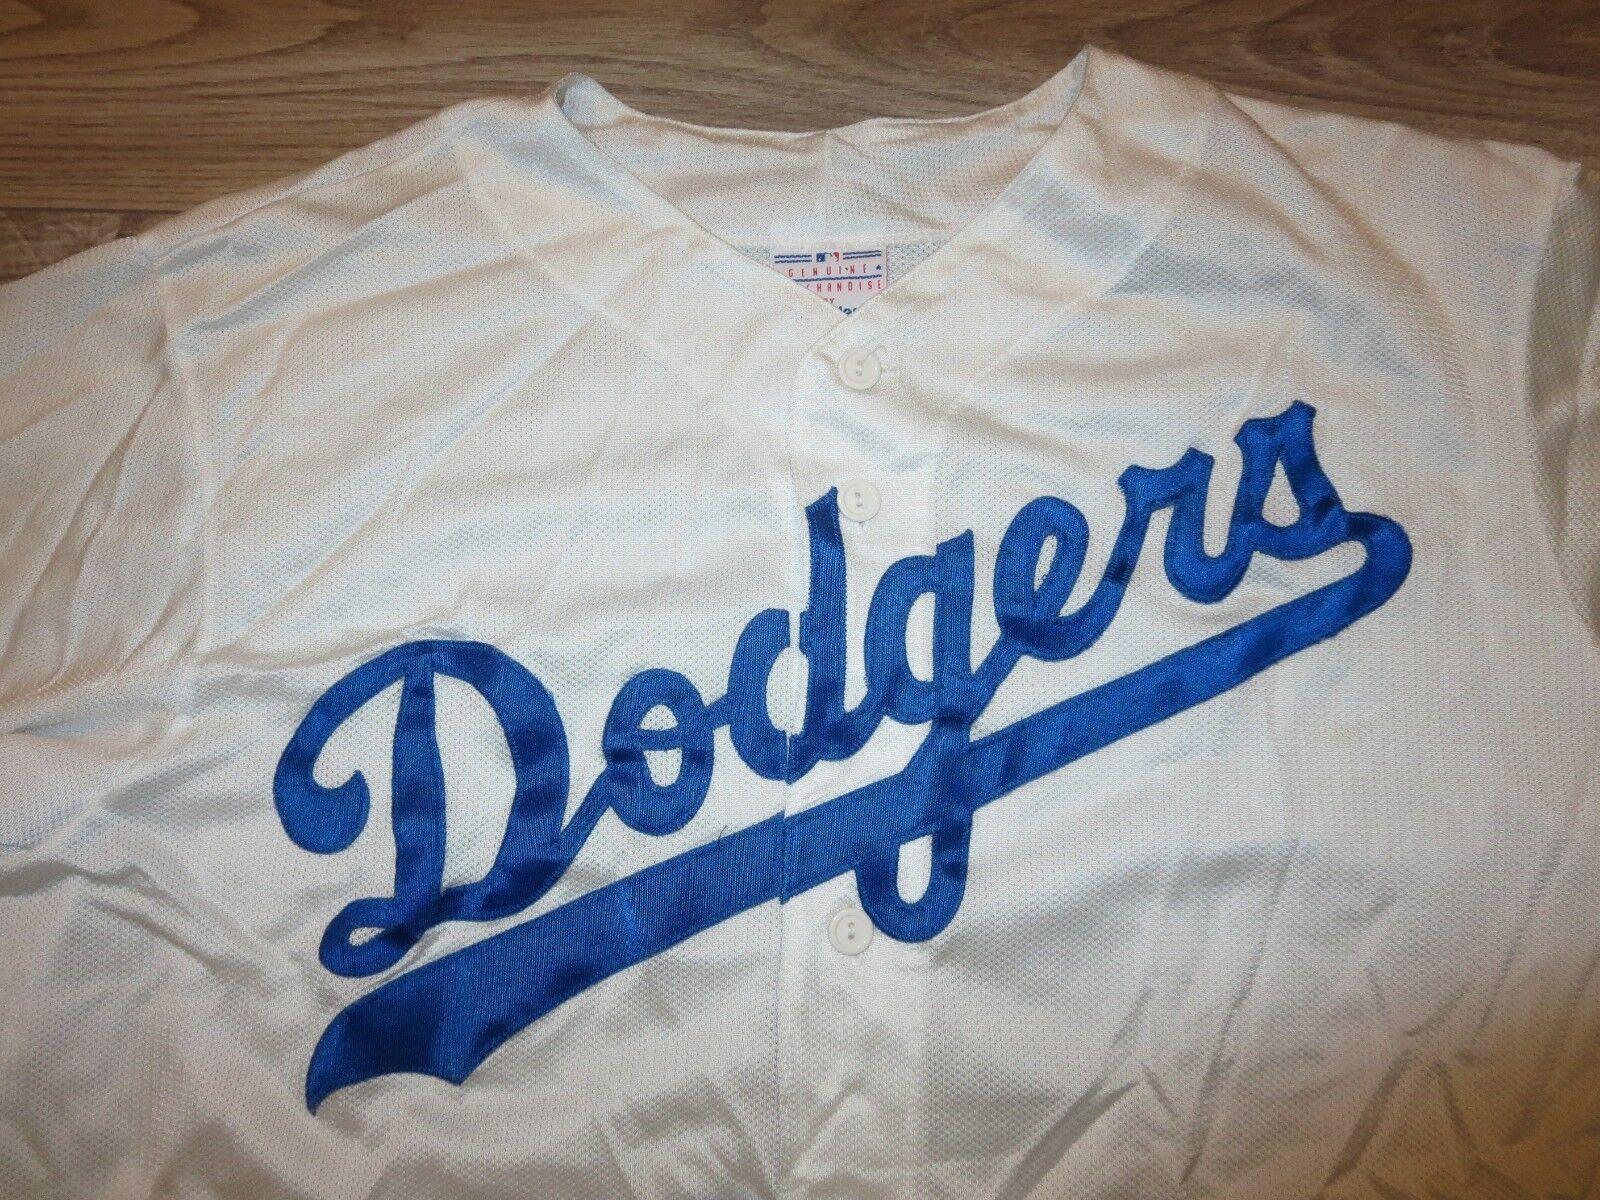 Los Angeles Dodgers Baseball MLB Majestätisch Trikot Jugendliche Jugendliche Jugendliche XL 18-20 Kind 006157